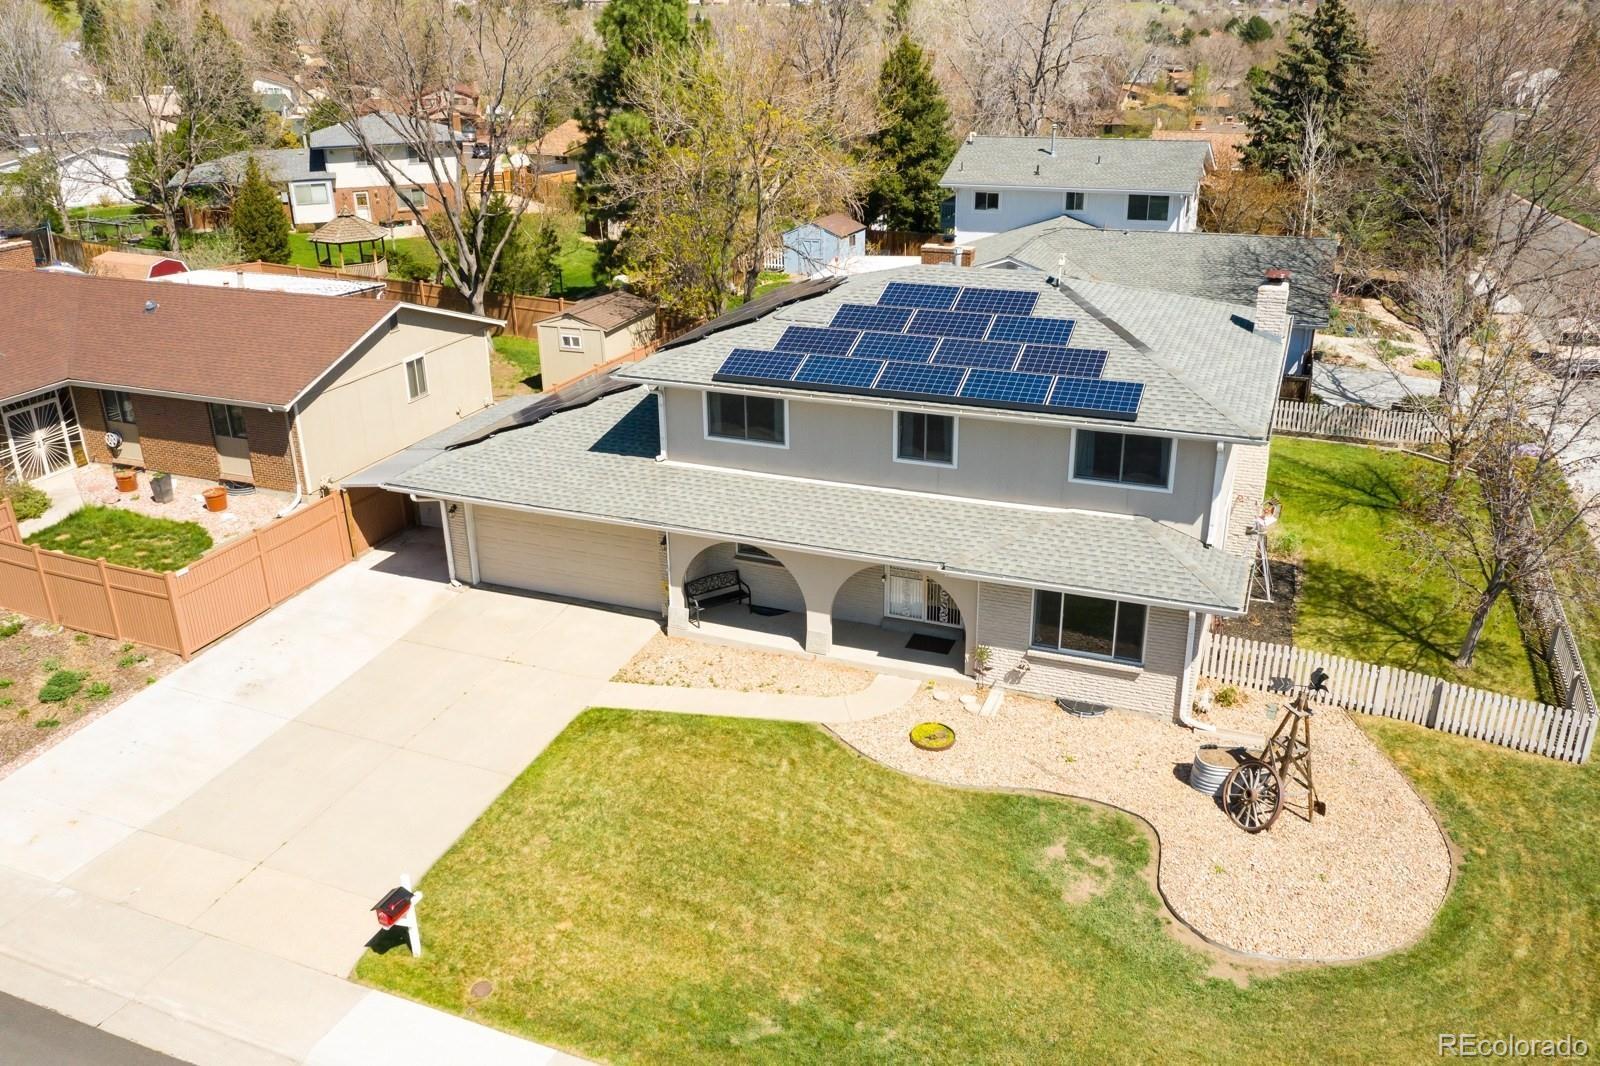 10925 W Montana Place, Lakewood, CO 80232 - Lakewood, CO real estate listing